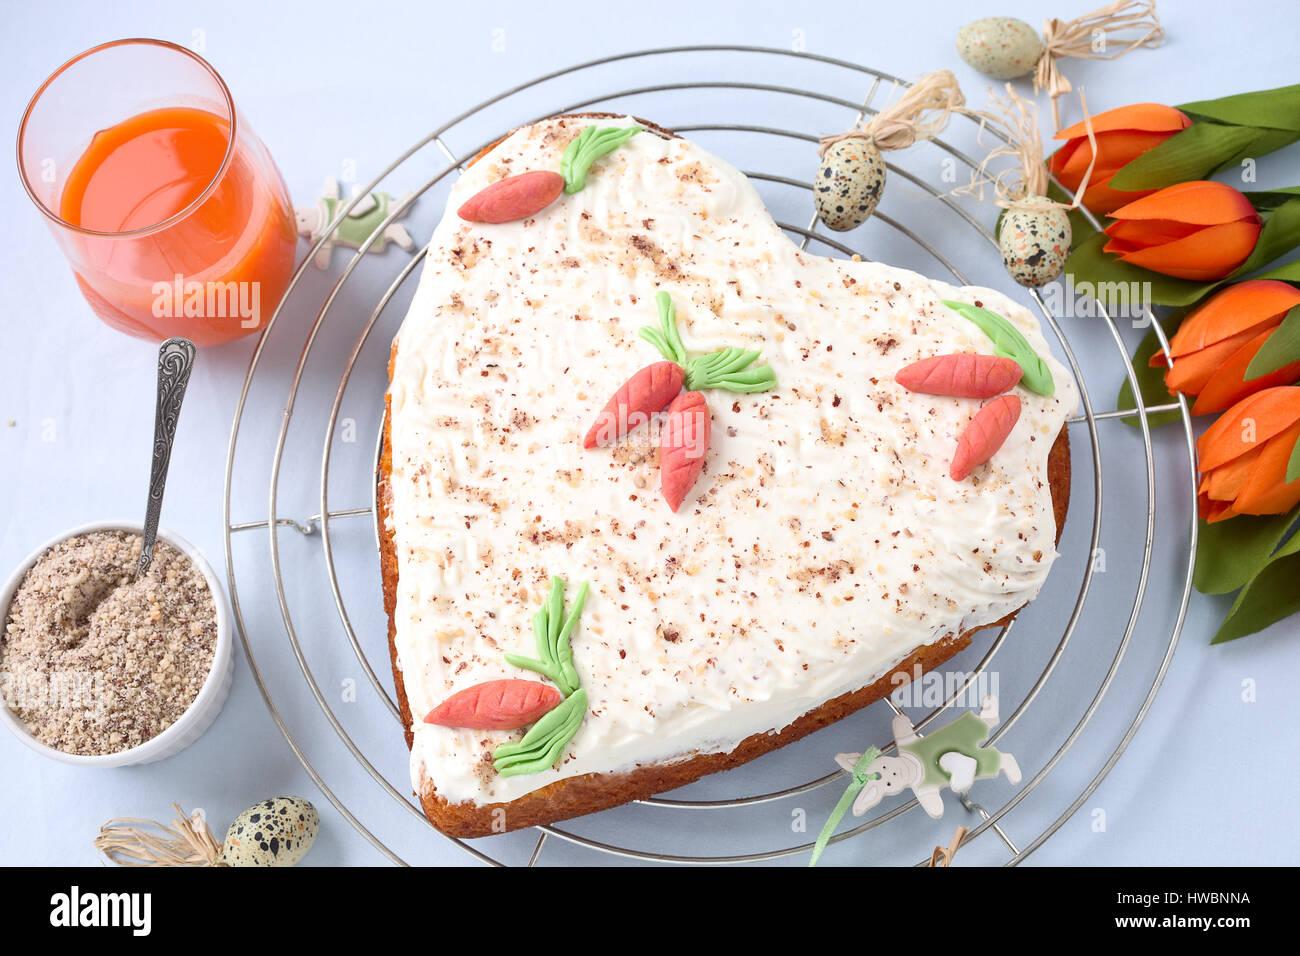 Food Network Recipes Ina Garten Carrot Cake